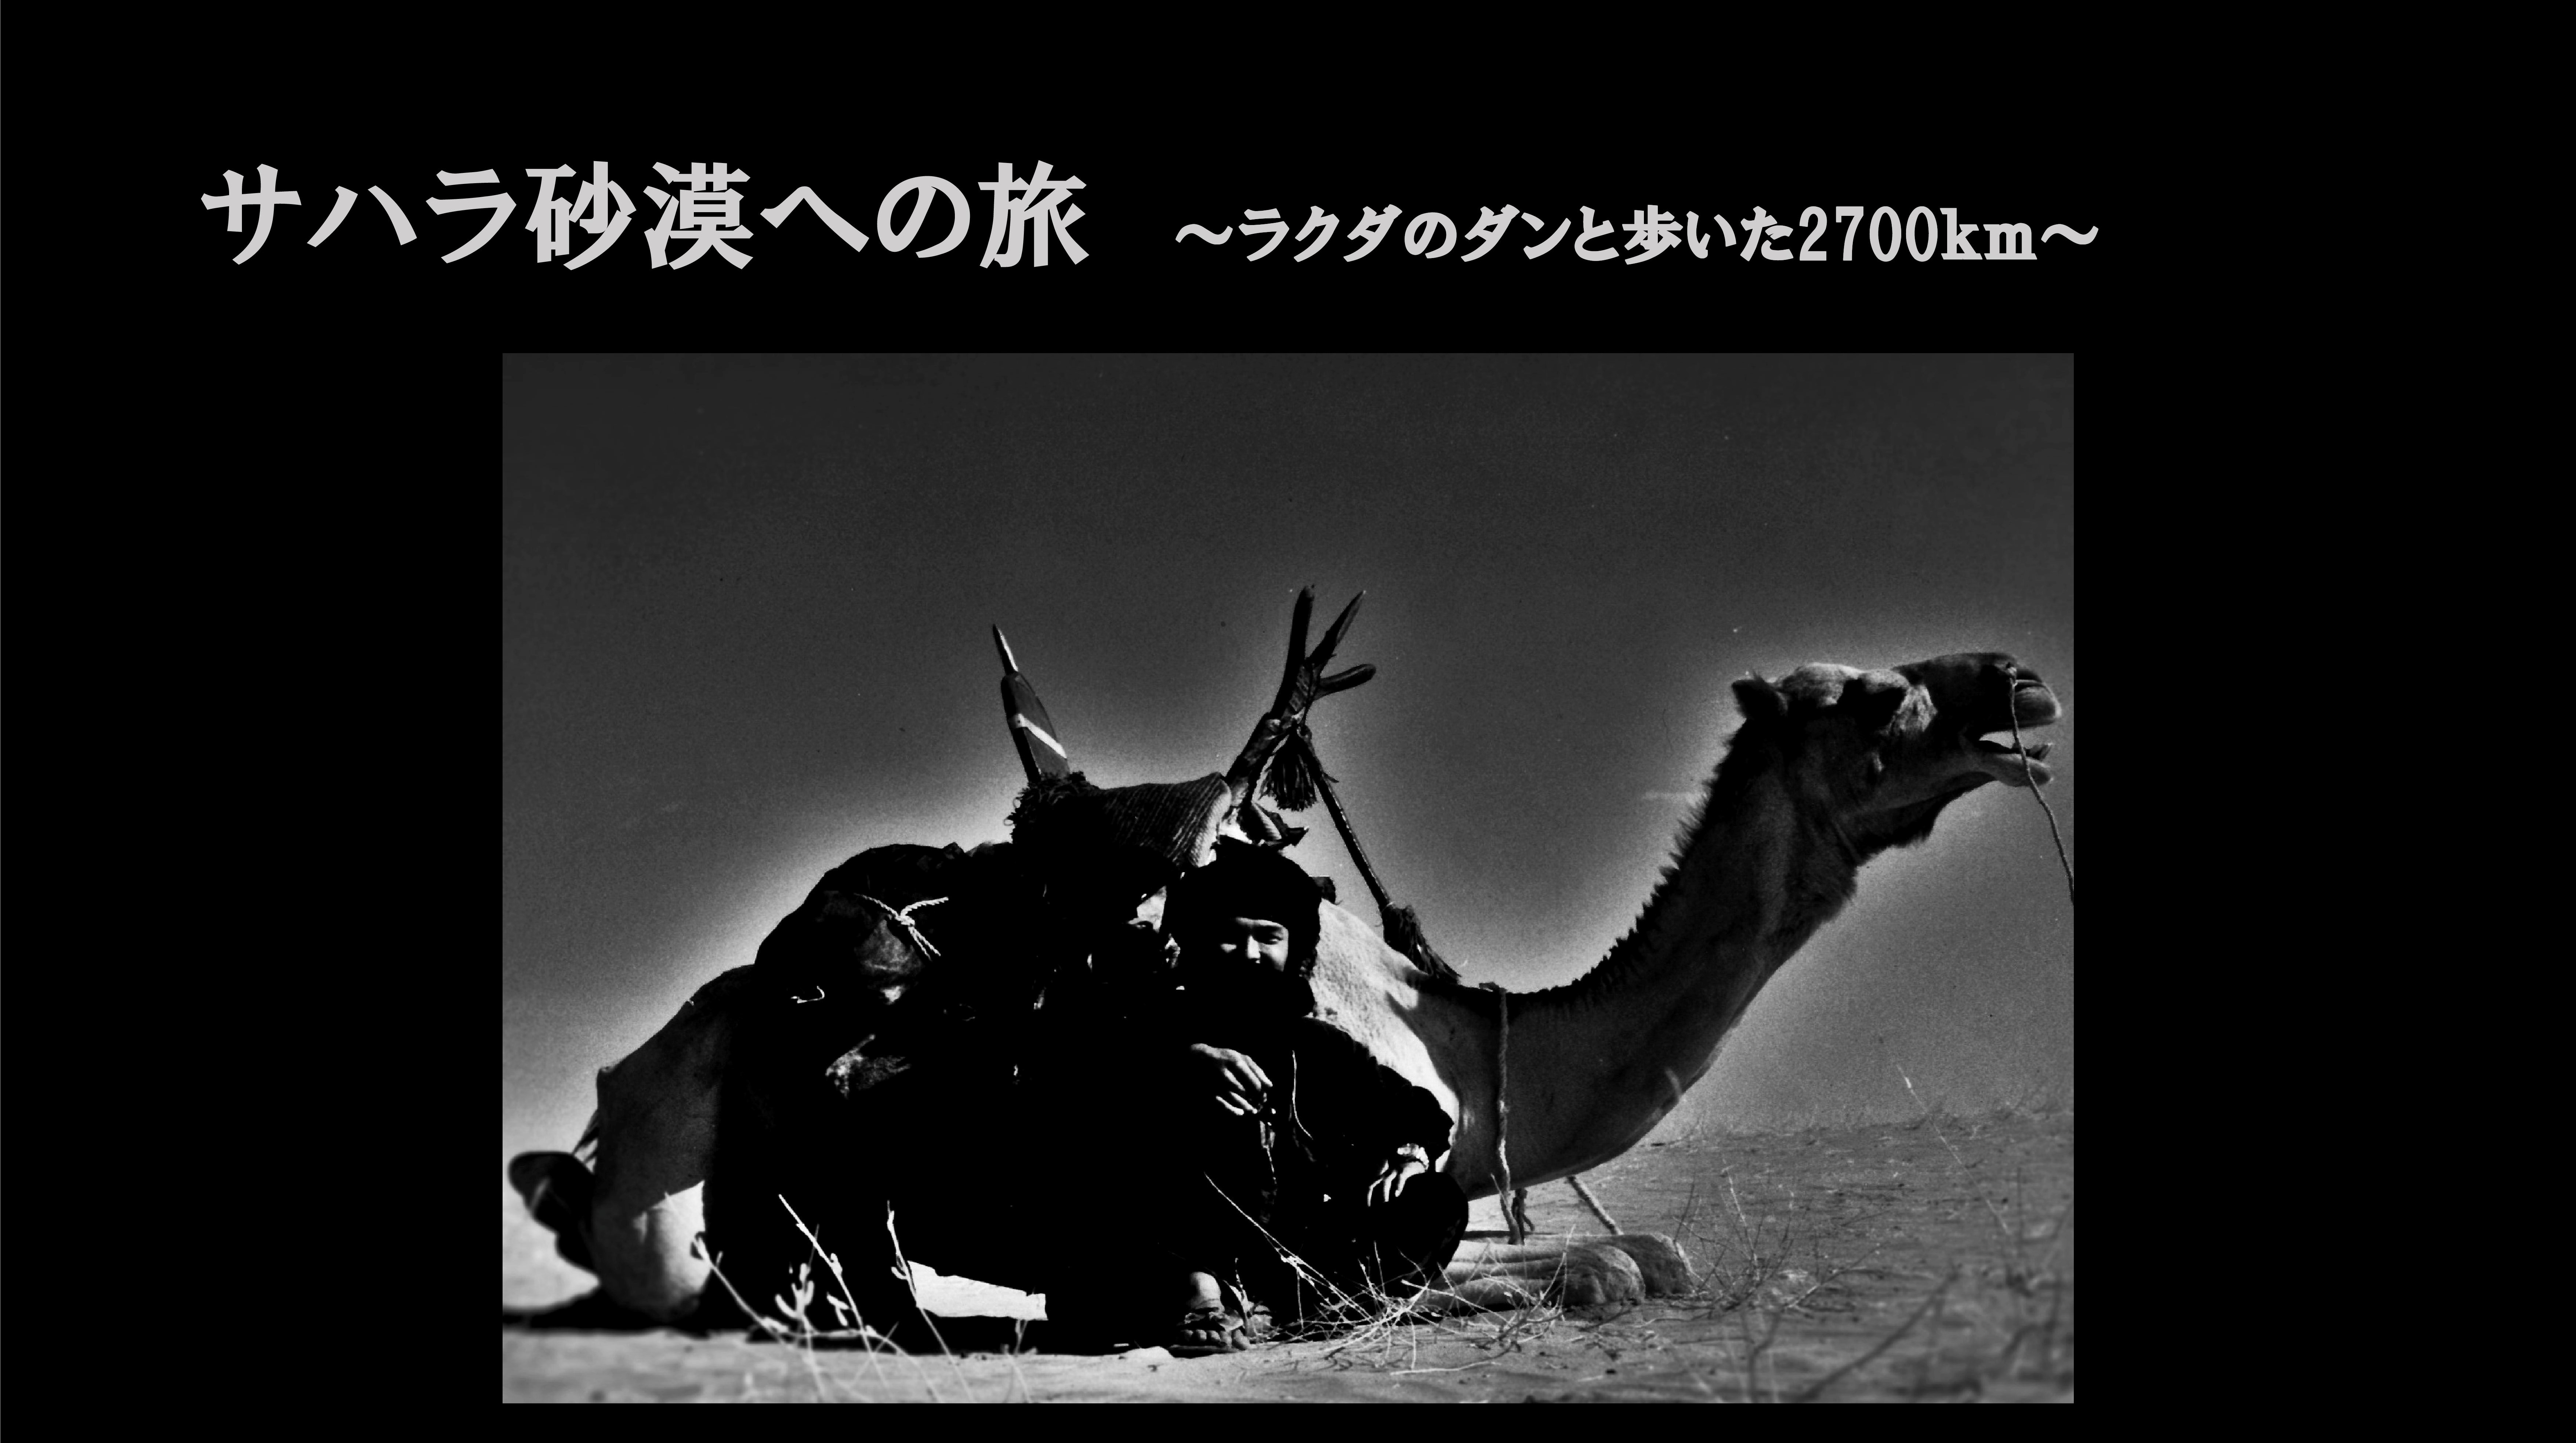 Microsoft PowerPoint - サハラ砂漠への旅